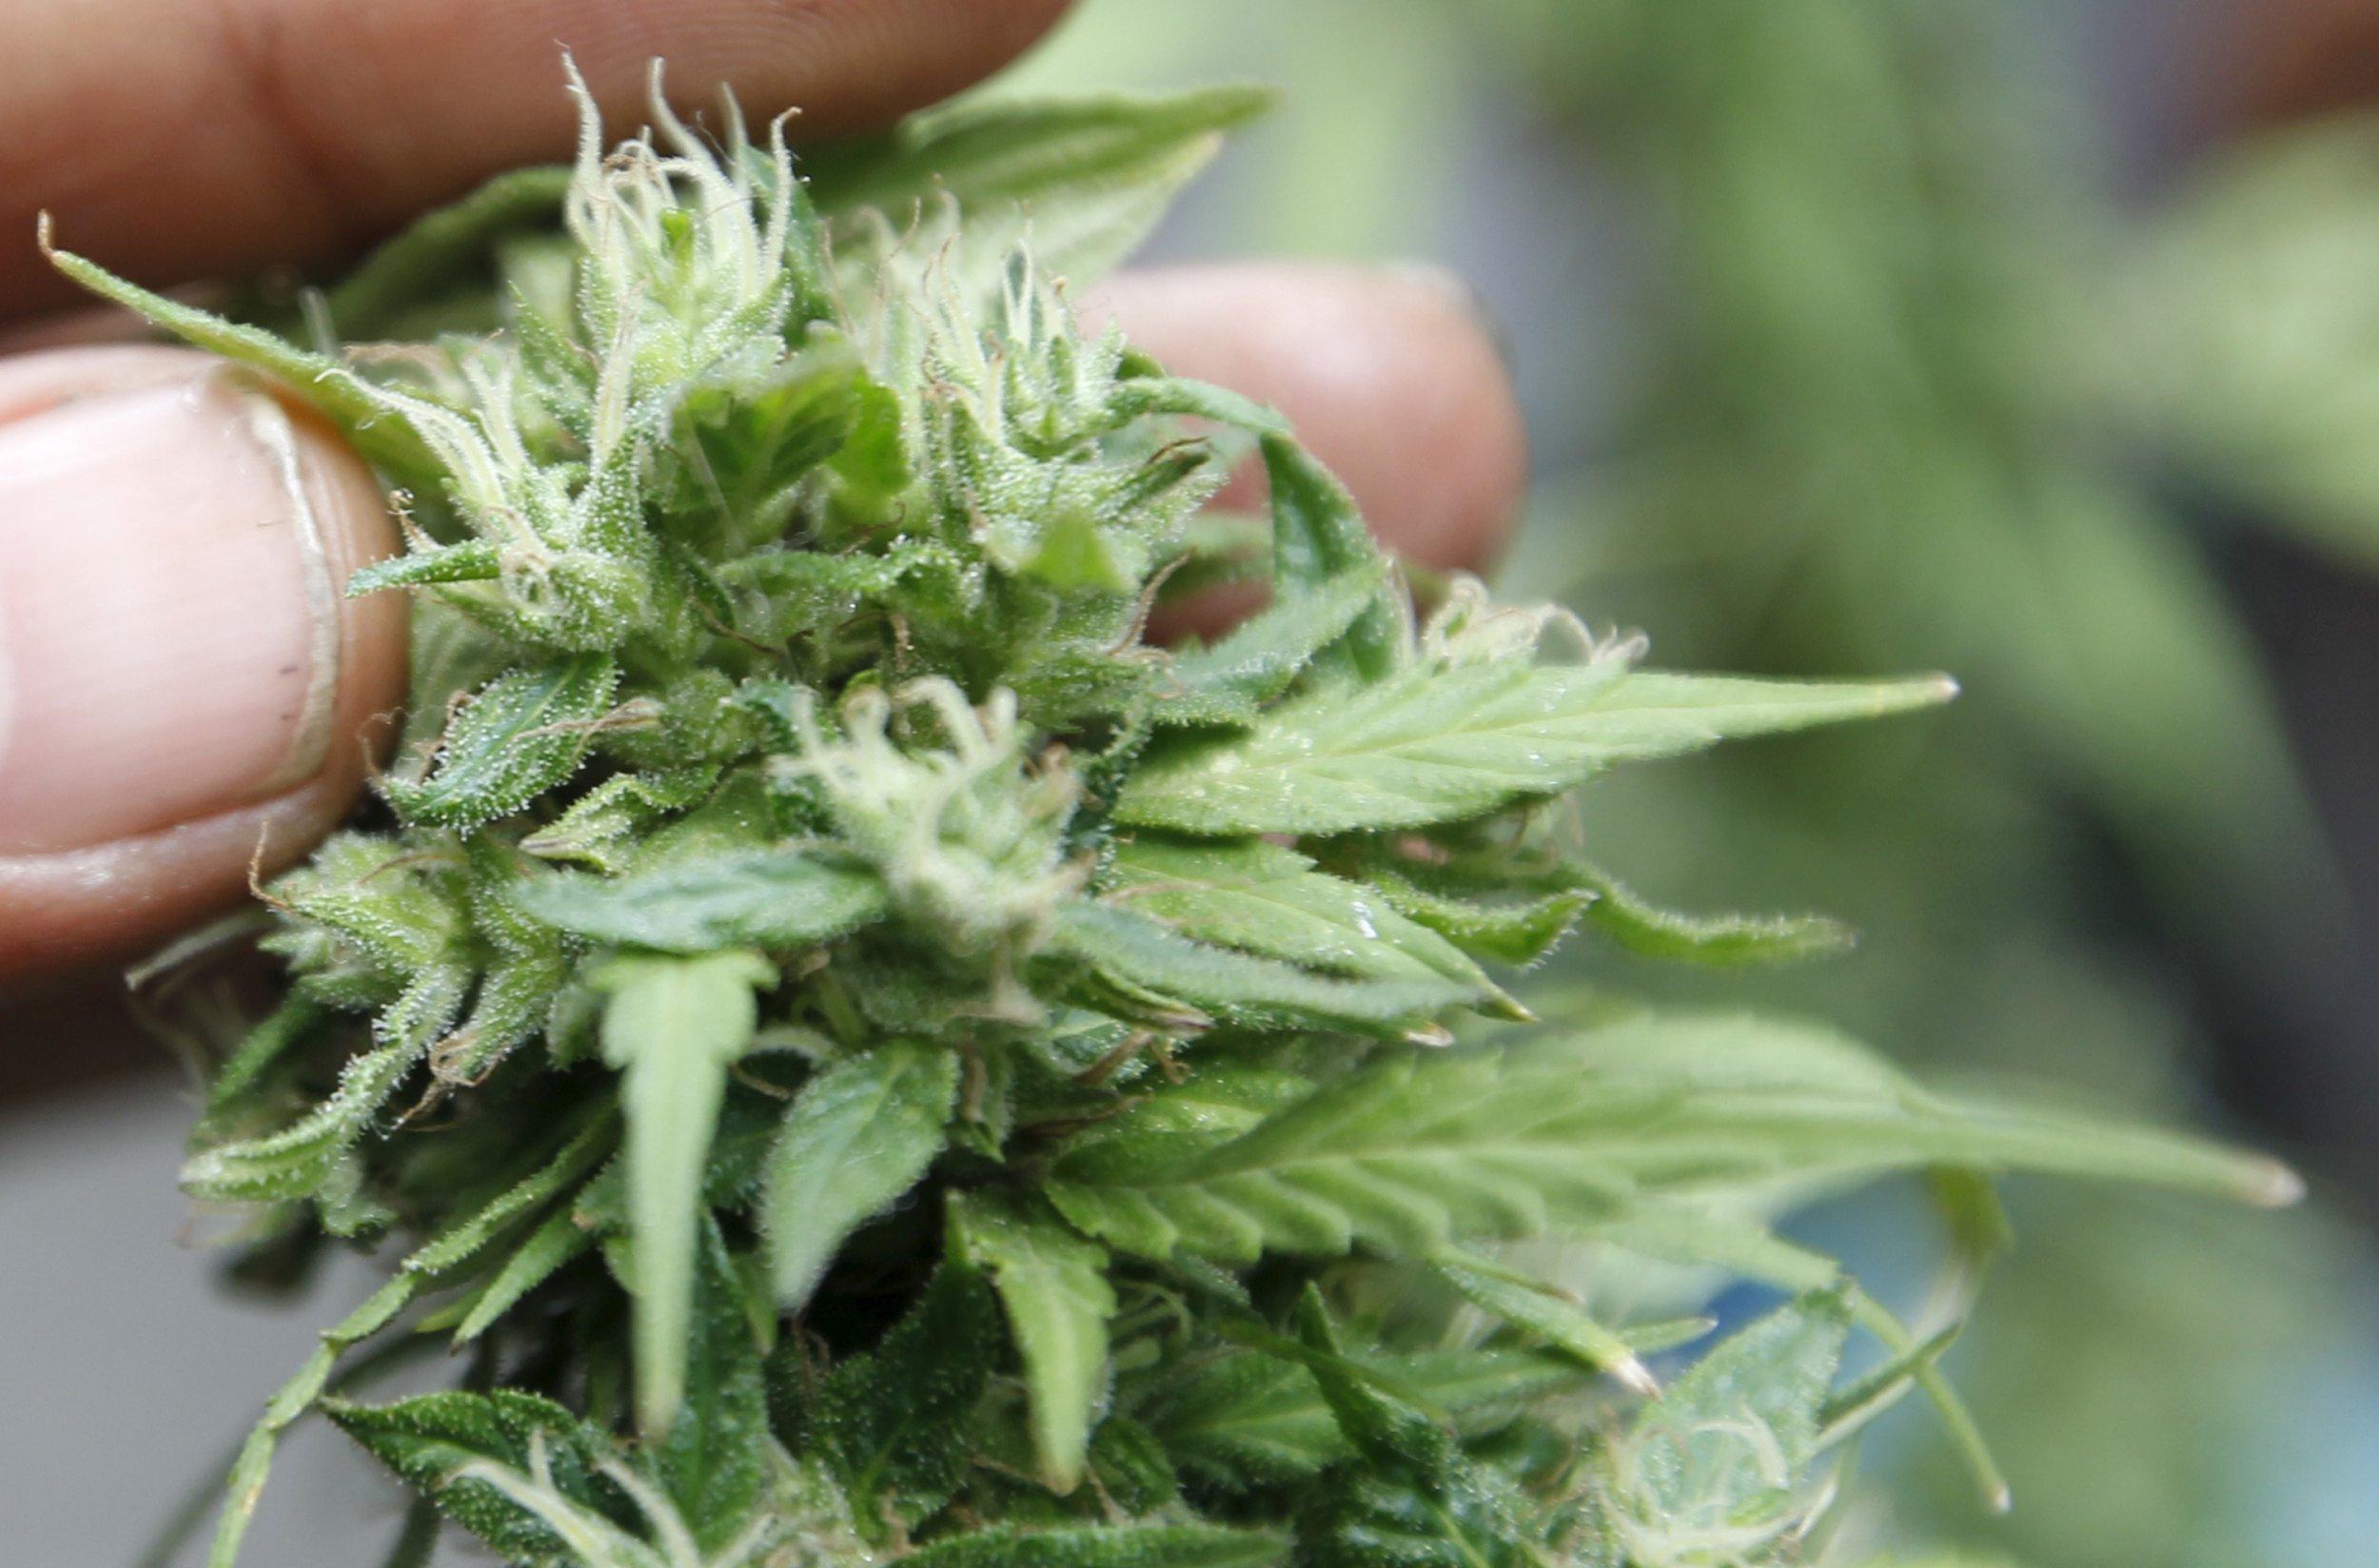 11_09_Legal_Weed_01